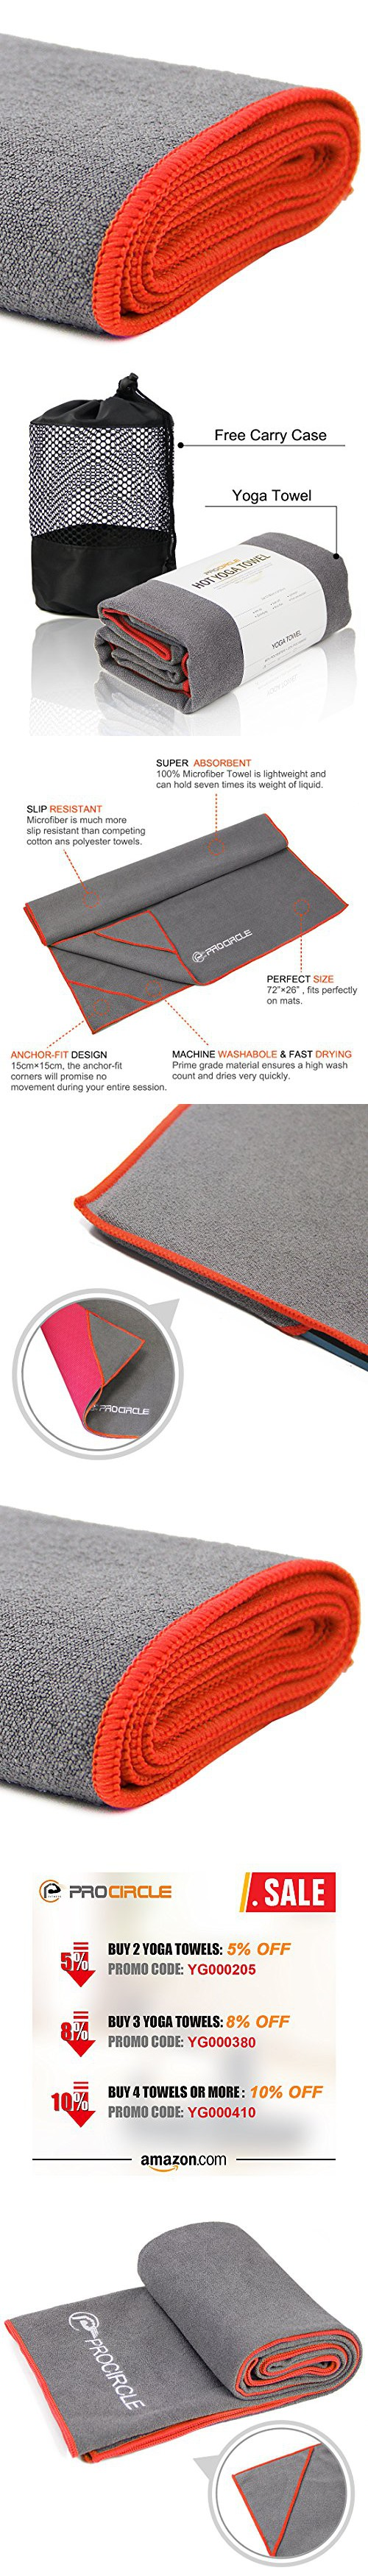 PROCIRCLE Yoga Towel - Orange - Microfiber Hot Yoga Towel, Bikram Yoga Towel, Ashtanga Yoga Towel - Super Absorbent, Non Slip, Machine Washable, Fast Drying - Free Carry Case